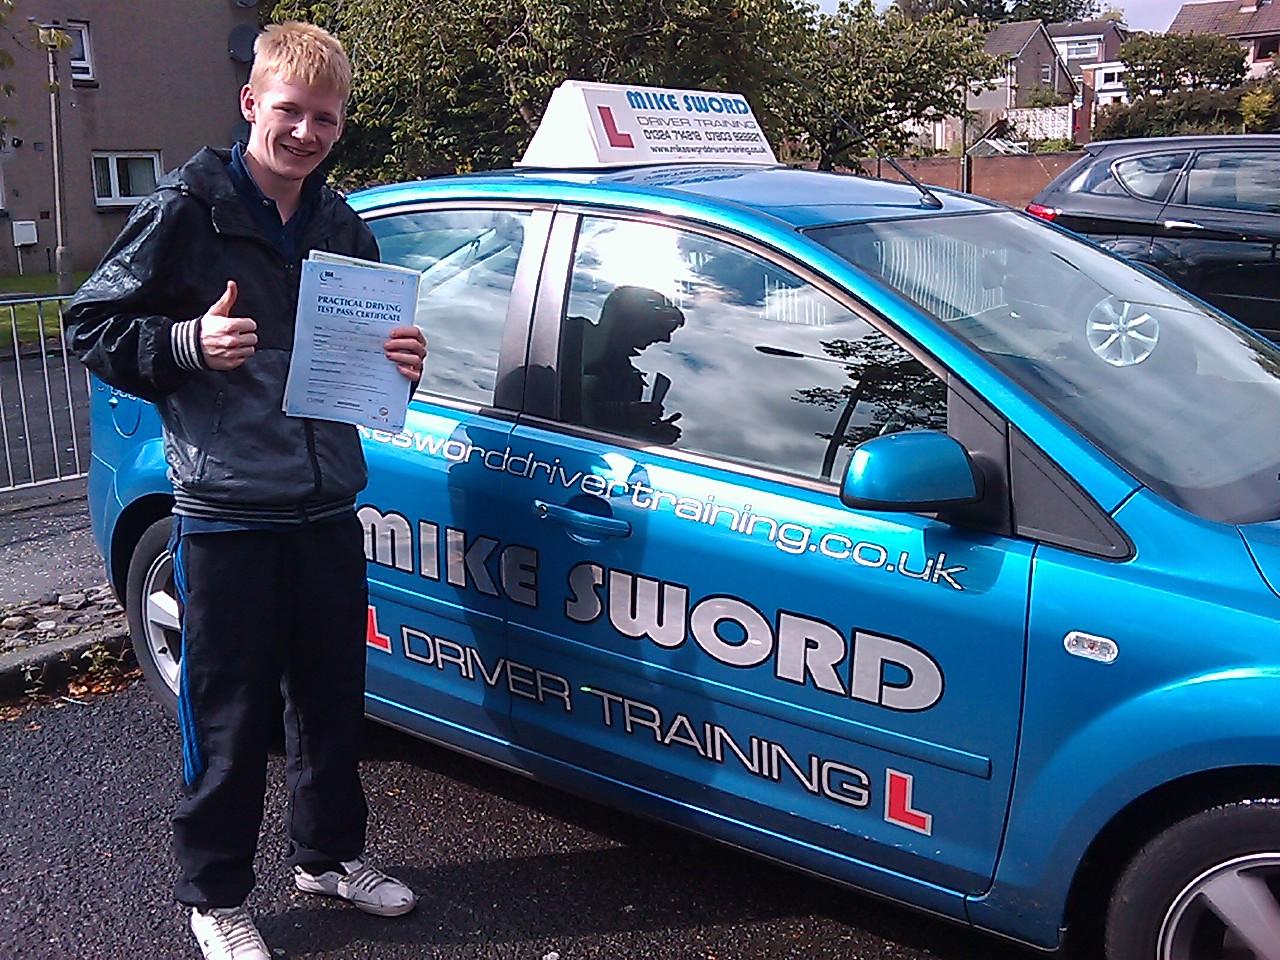 Alan Scobbie Mike Sword Driver Training